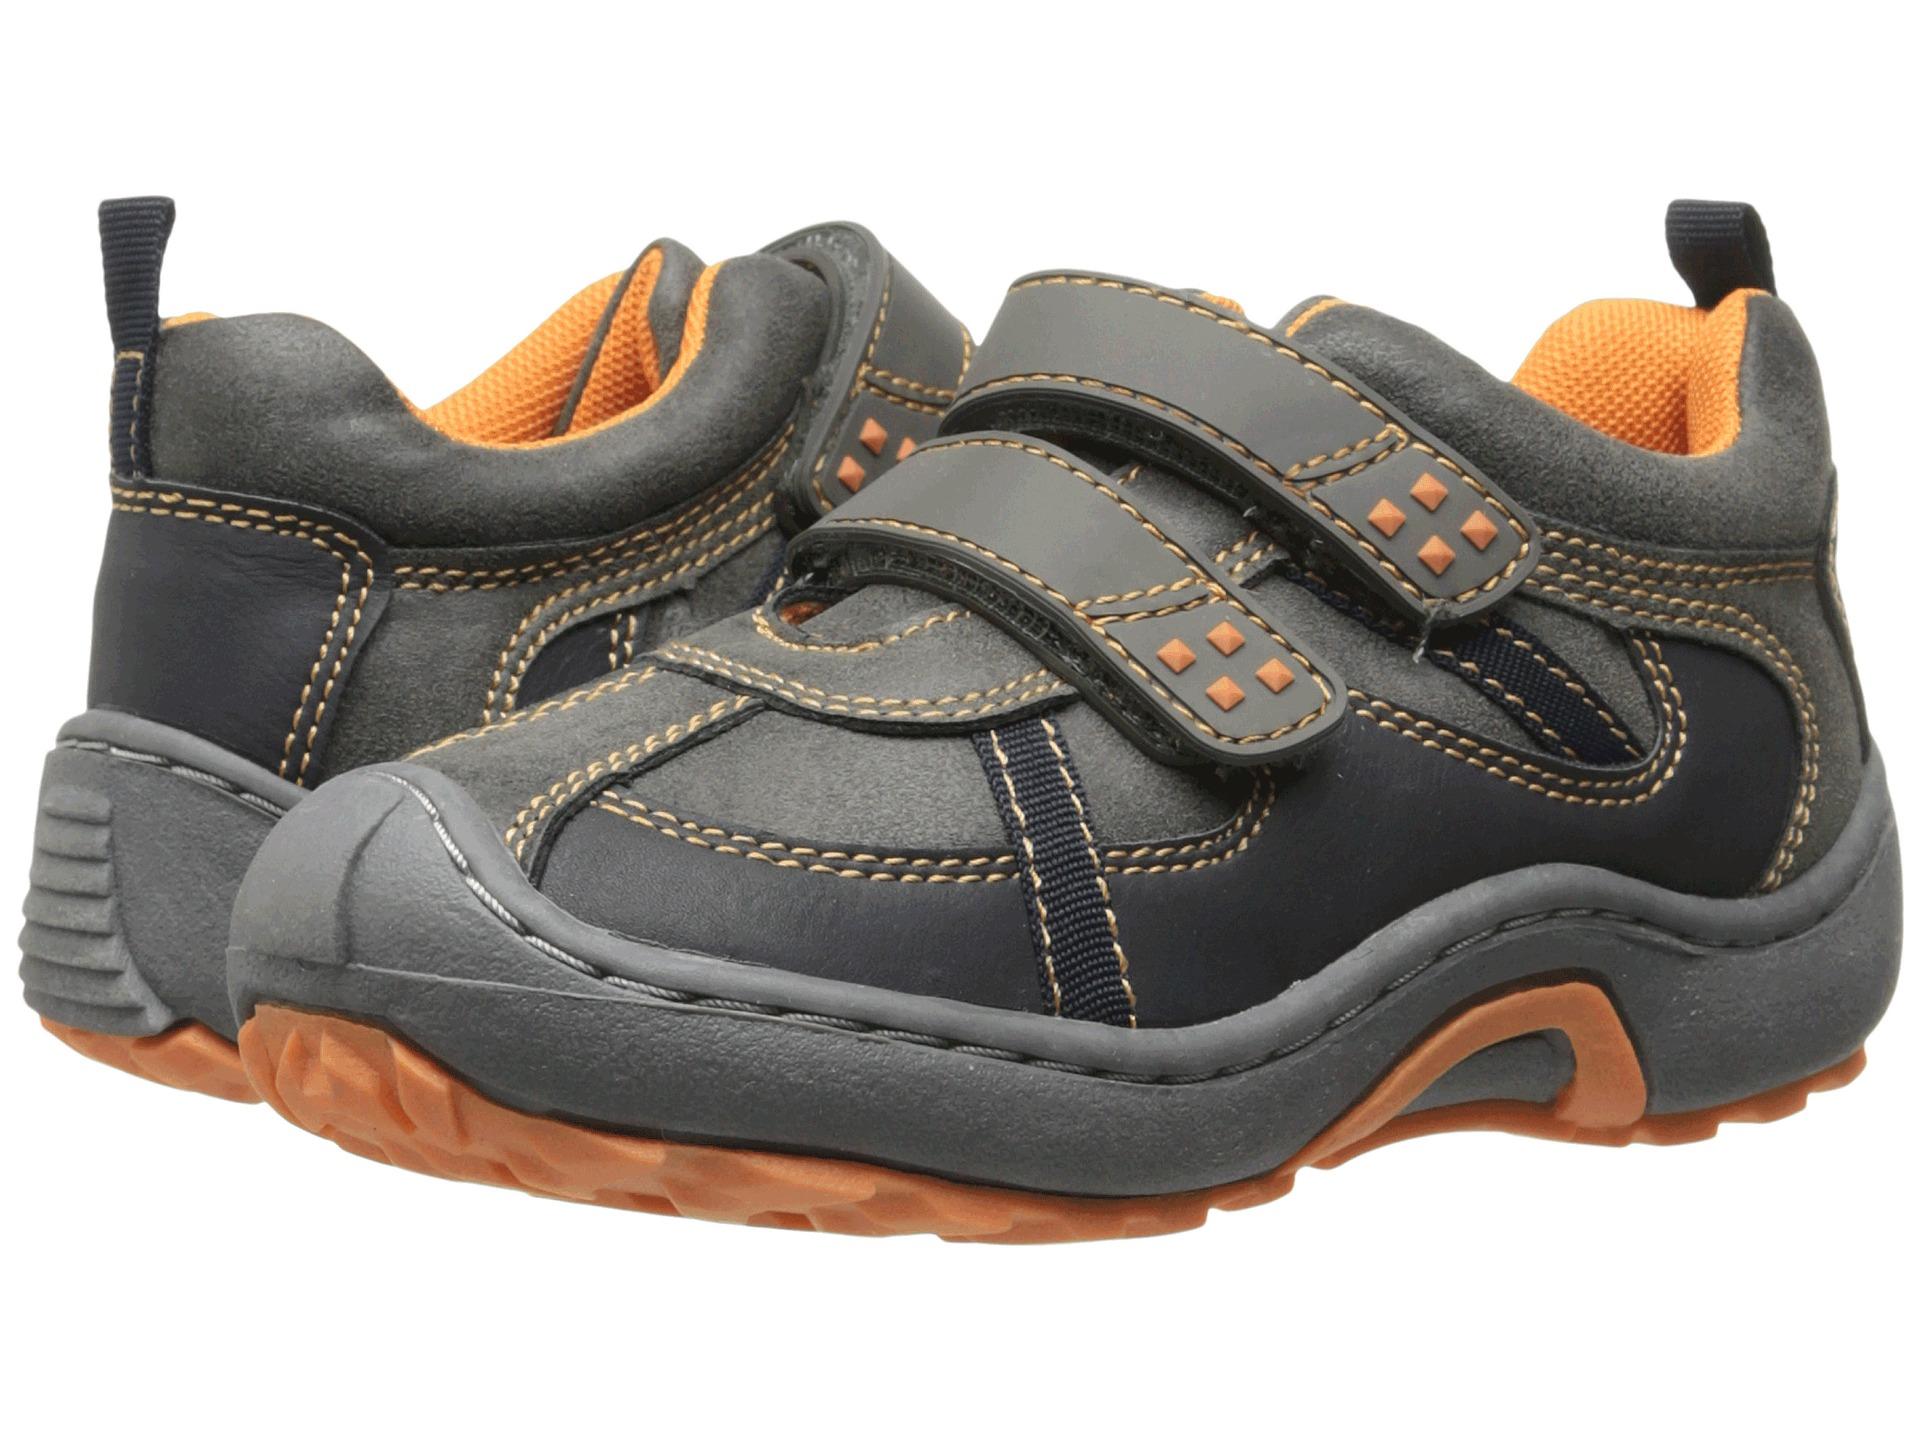 Jumping Jacks Toddler Shoes Reviews